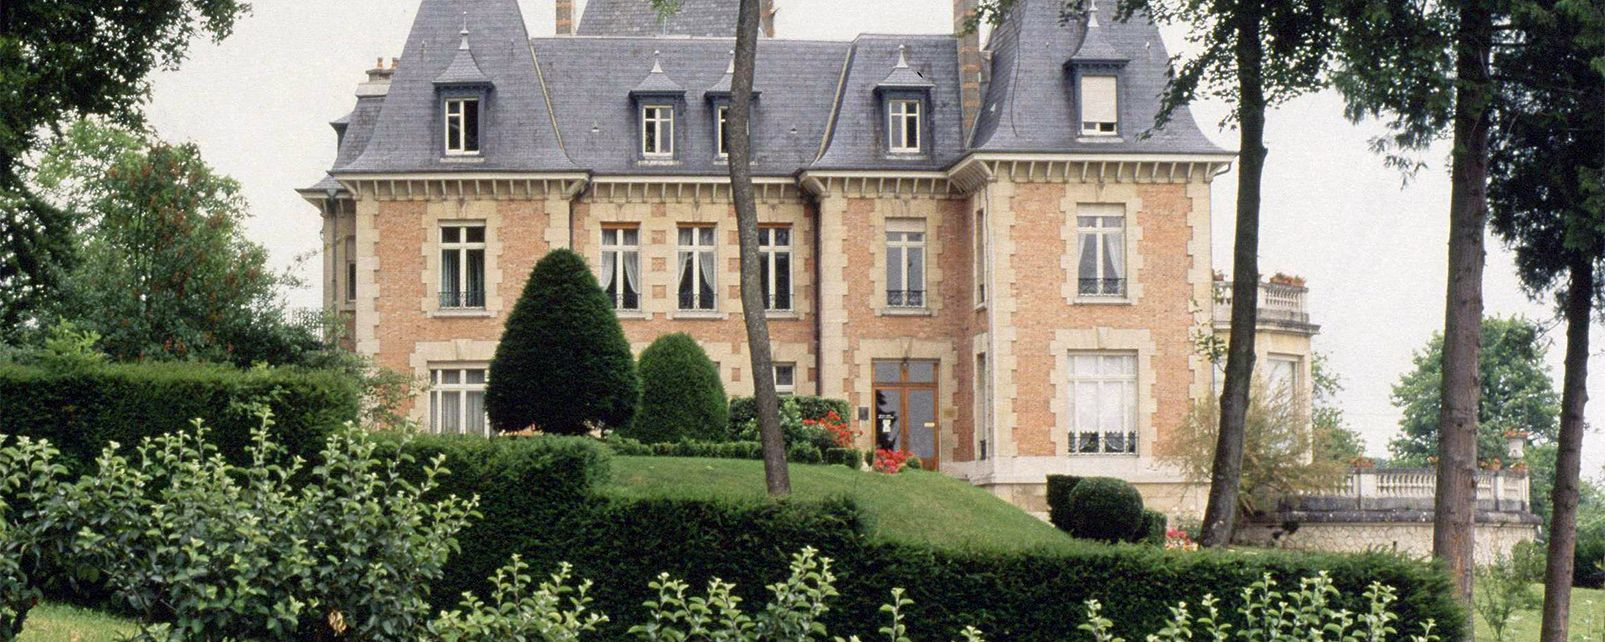 A Sampigny , France